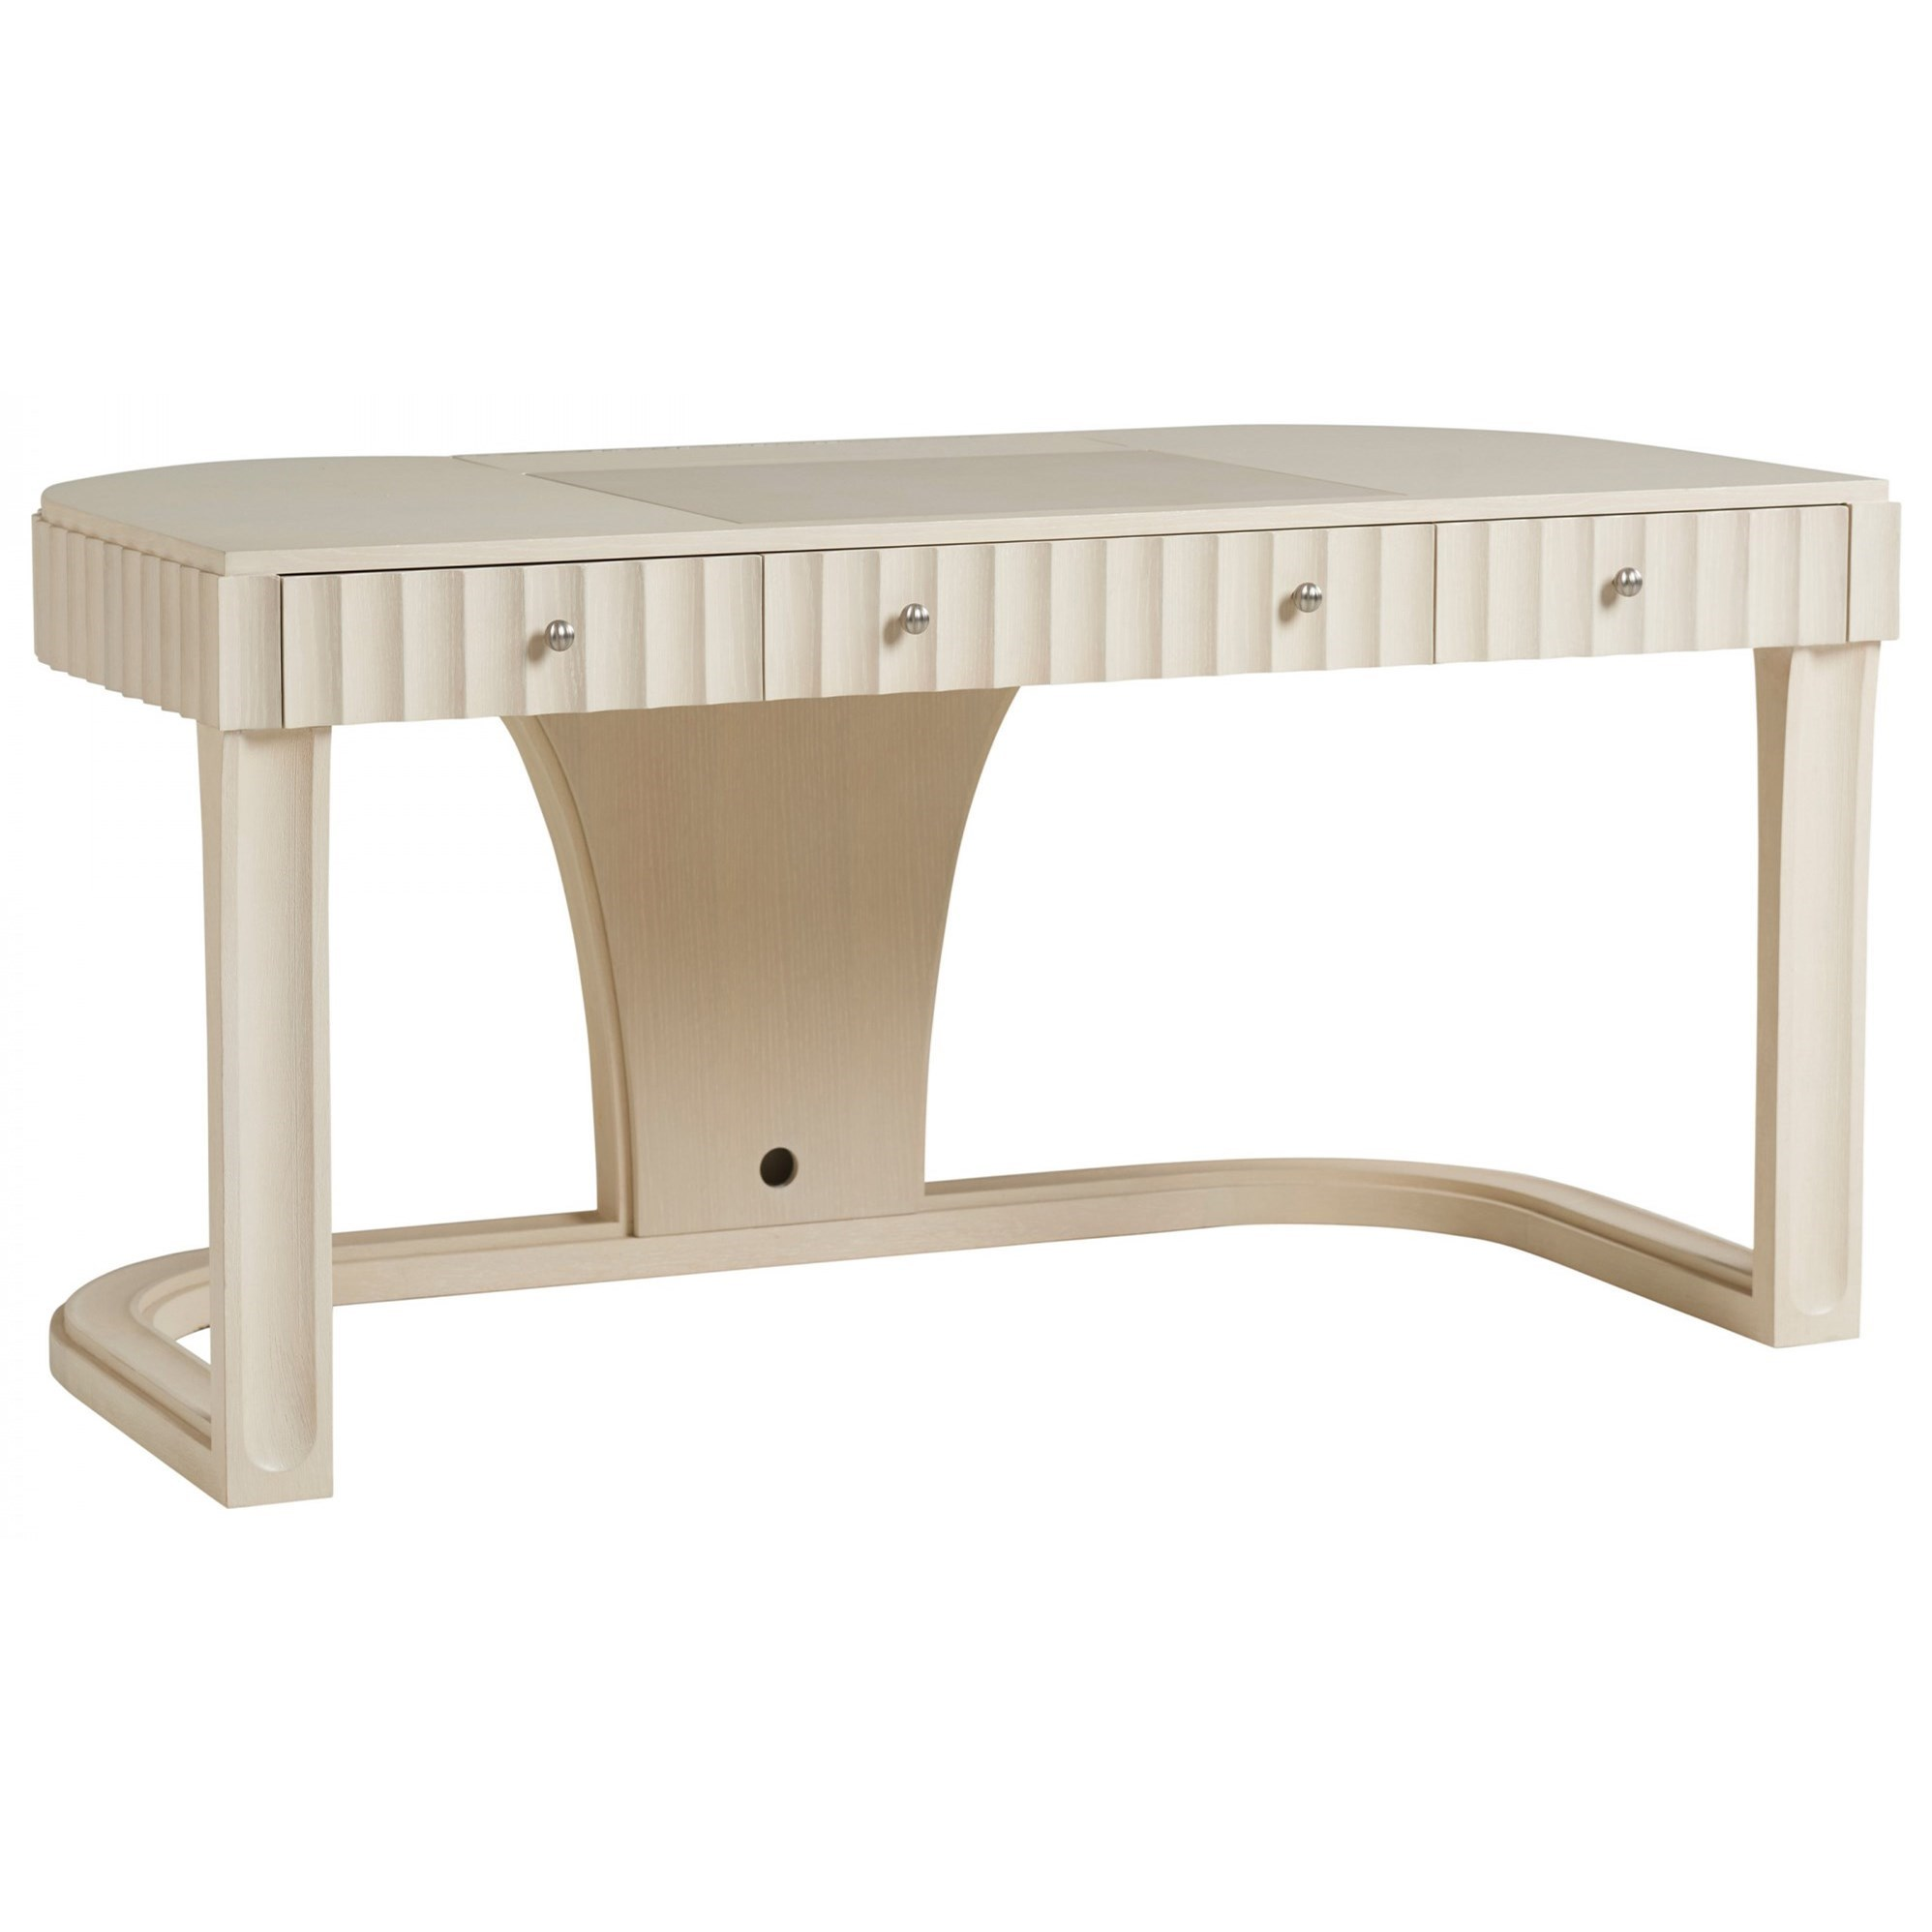 Cascades Caledonia Desk by Sligh at Baer's Furniture